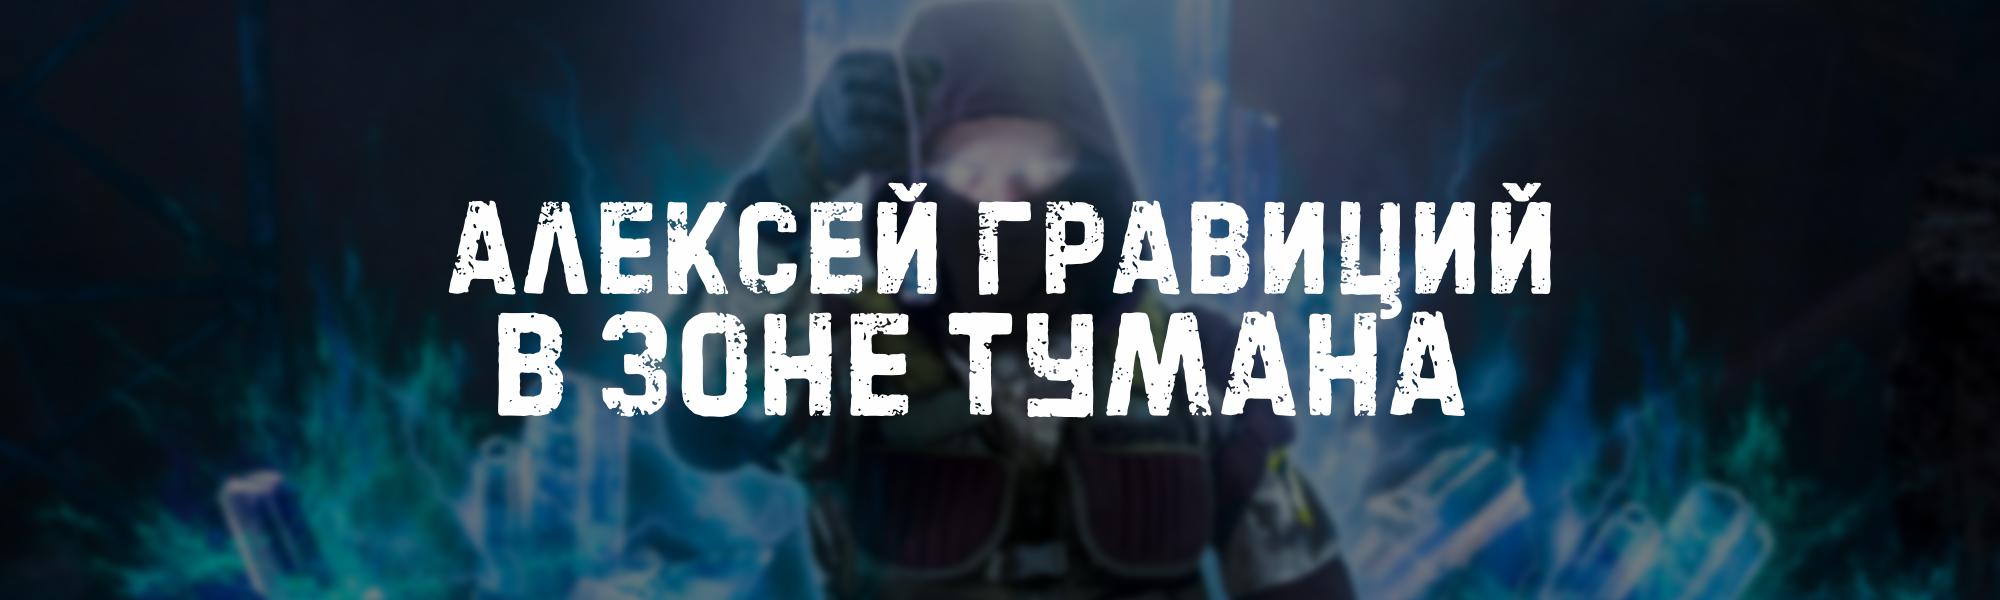 "Алексей Гравицкий - ""В зоне тумана"""